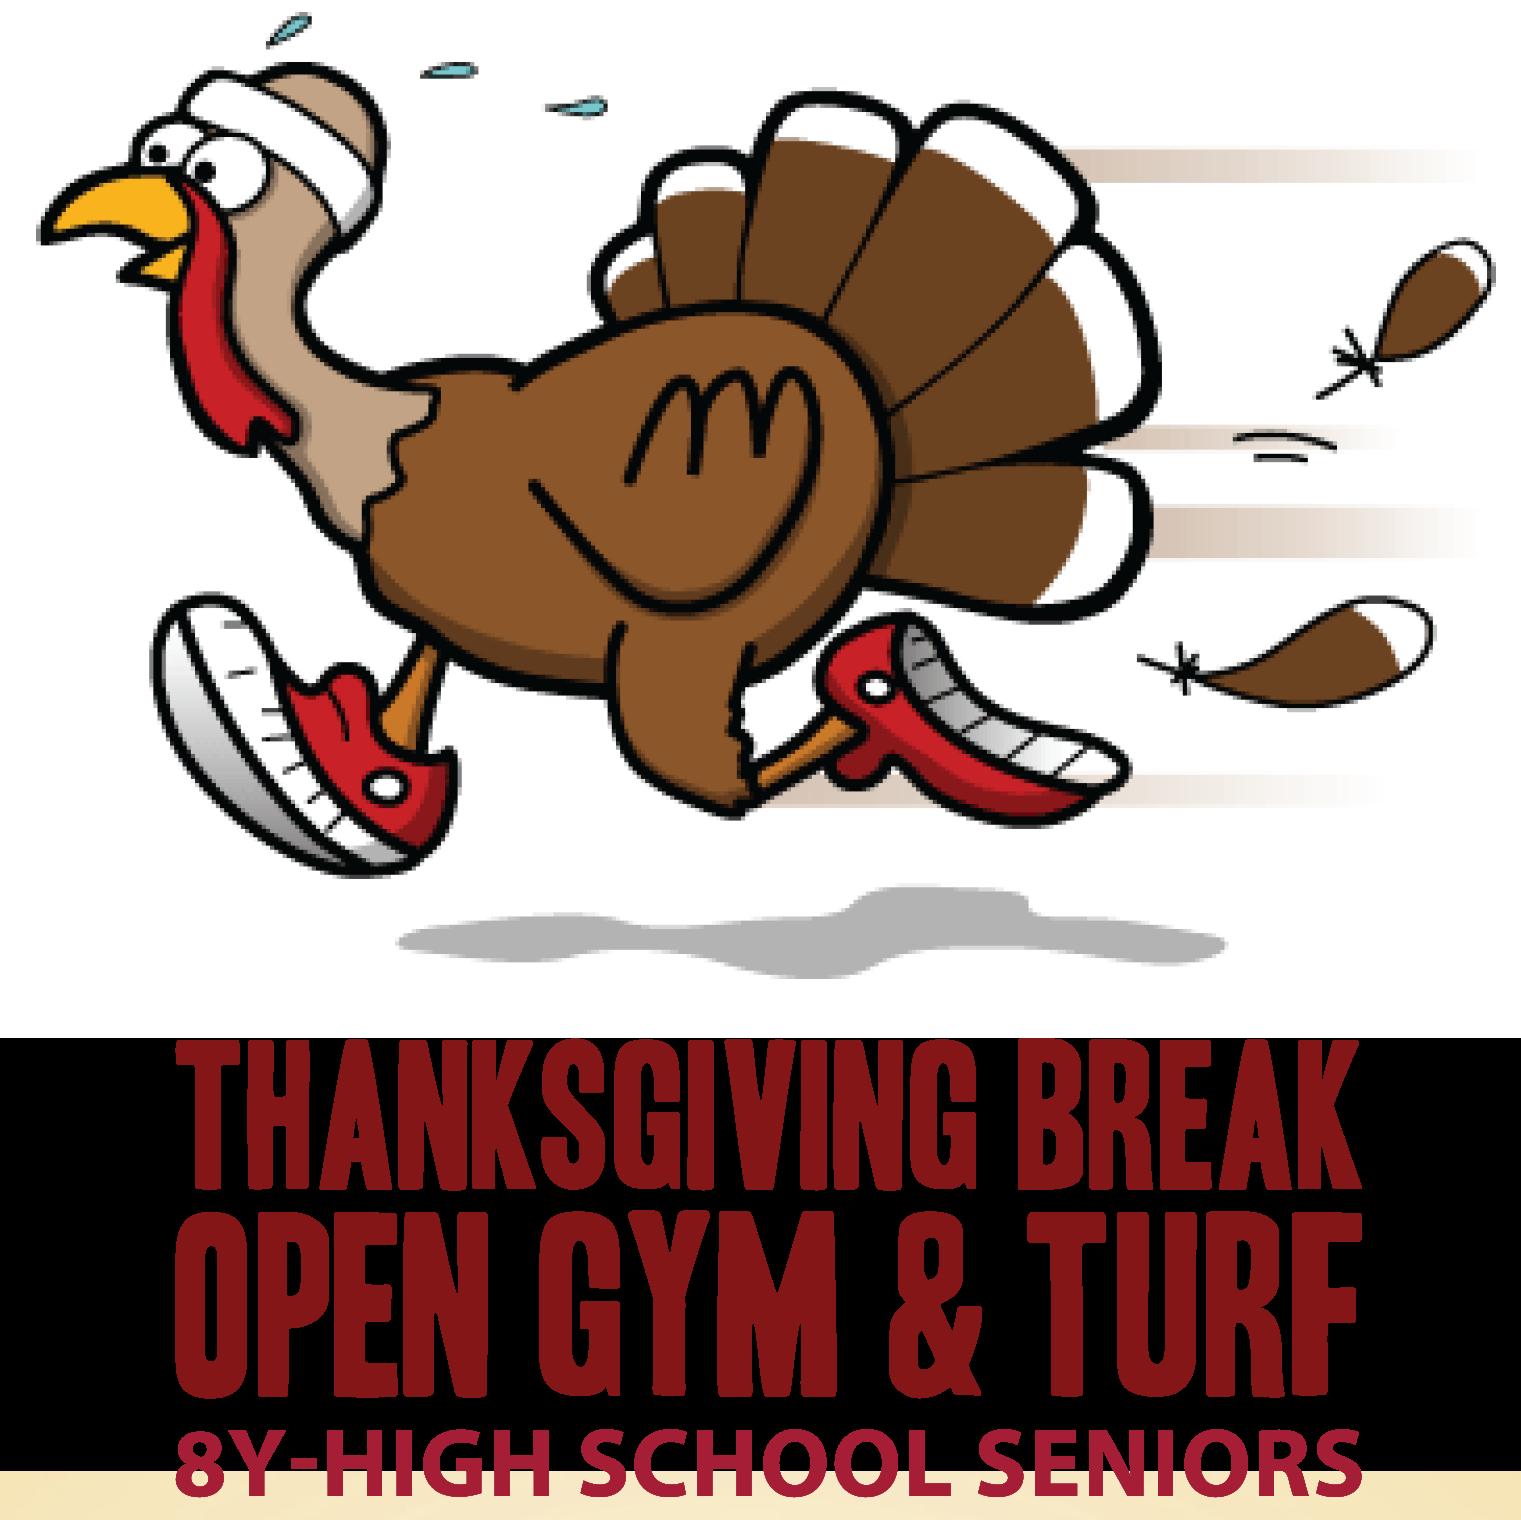 Family at thanksgiving break clipart jpg black and white download Thanksgiving Break Open Gym & Turf - Woodridge Park District ARC jpg black and white download